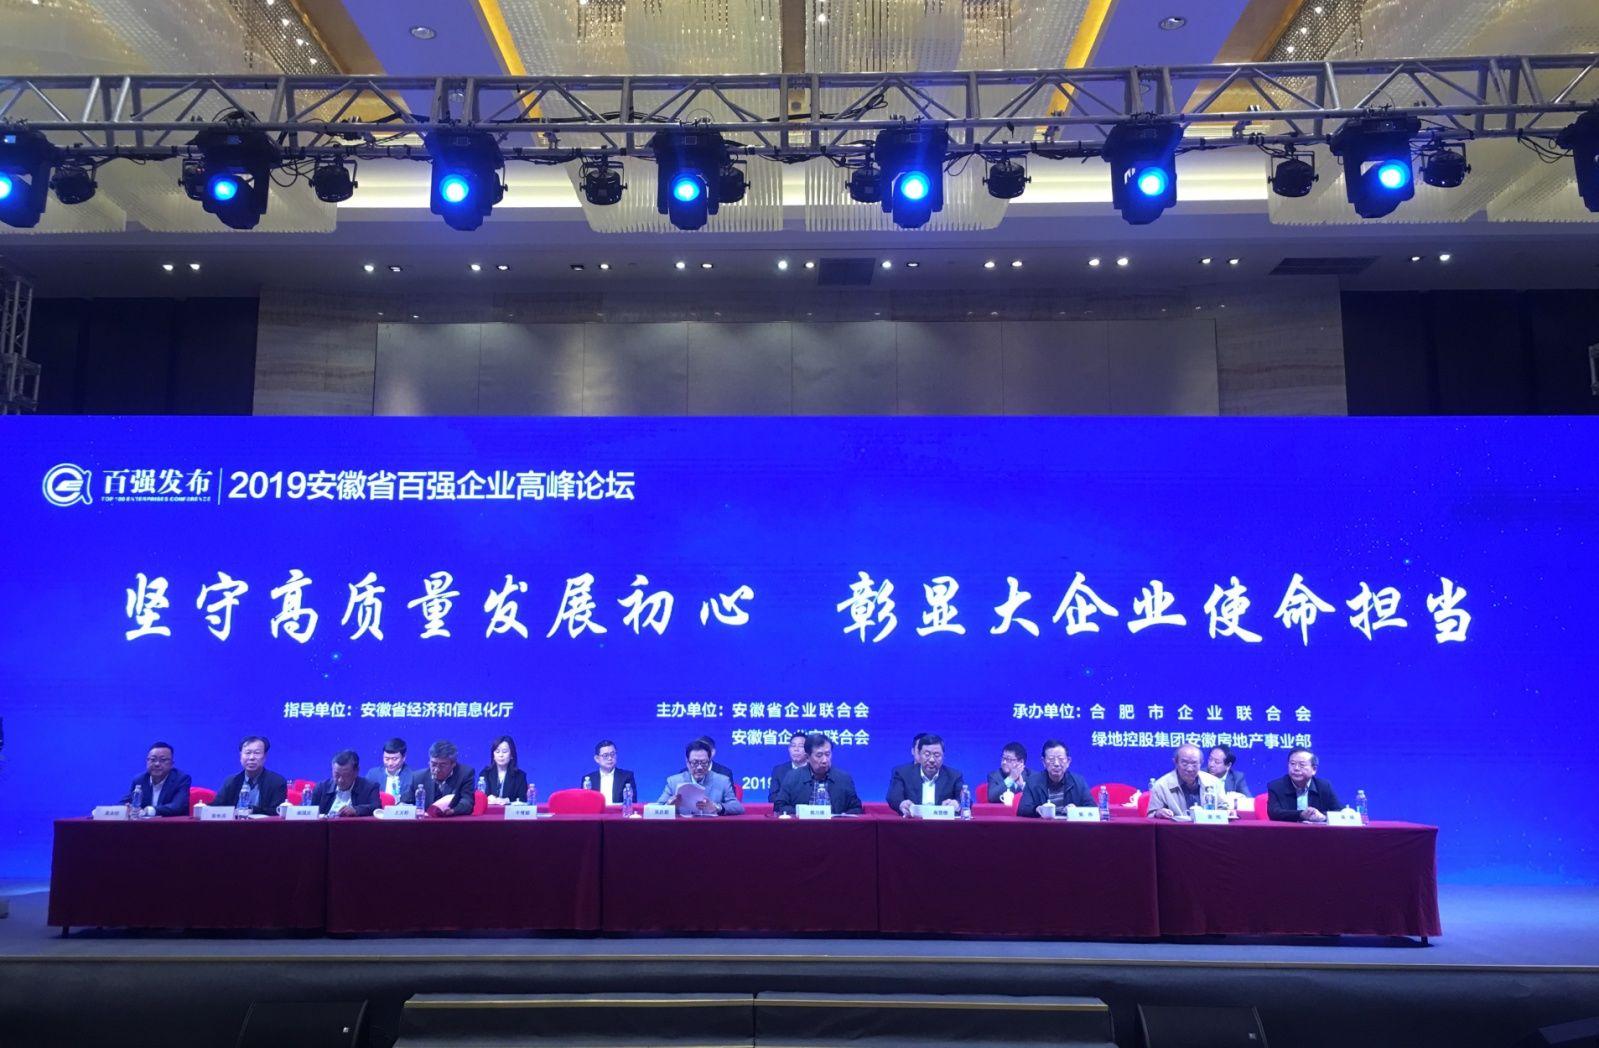 http://www.ahxinwen.com.cn/anhuifangchan/92999.html